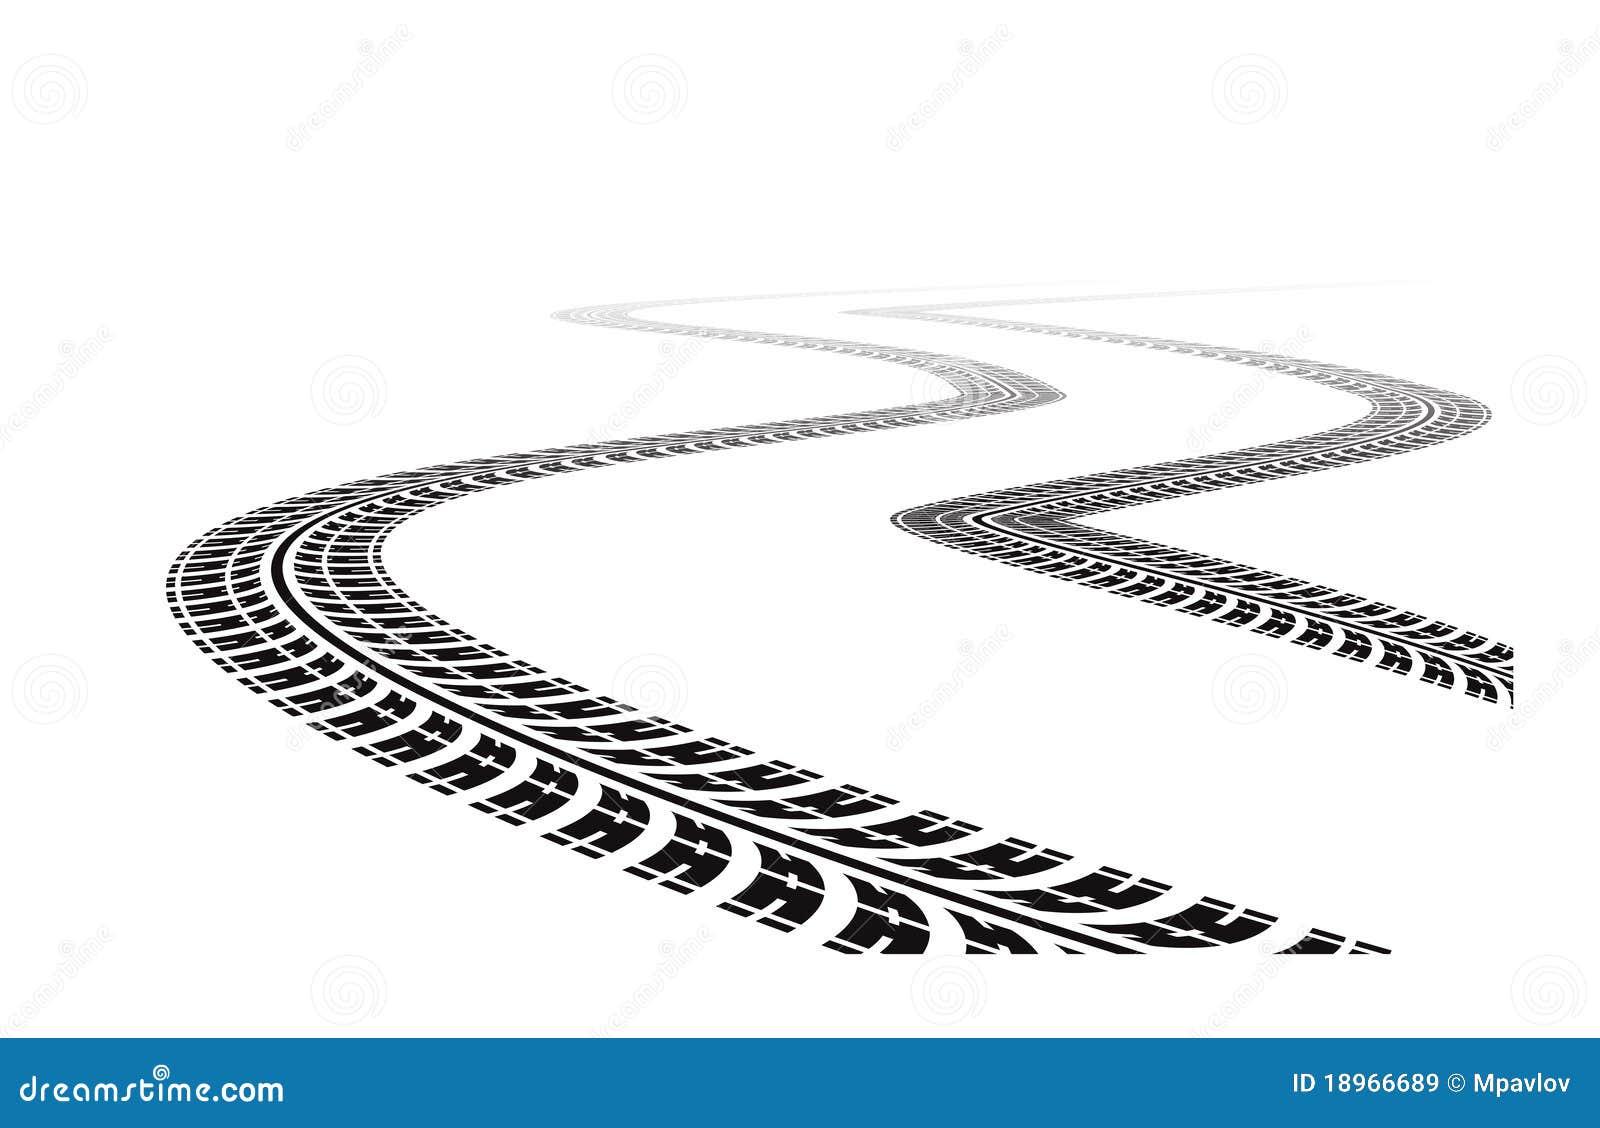 vector clipart tire tracks - photo #27